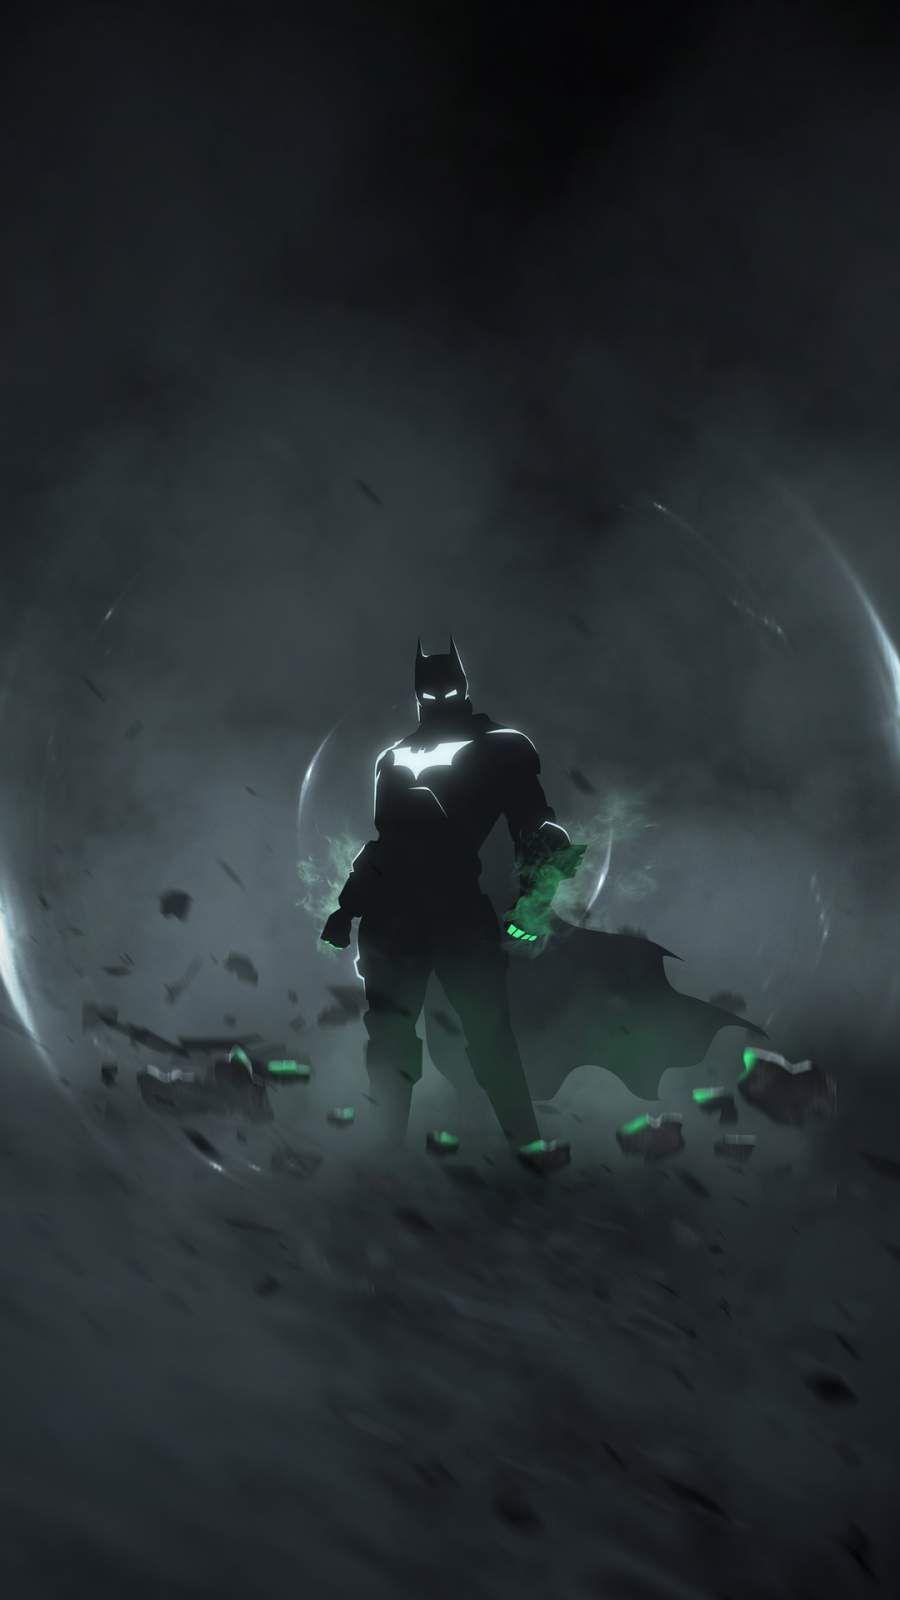 Free Download Ten Brilliant Ways To Advertise Batman Wallpaper Iphone 12 1204x2141 For Your De In 2021 Dc Comics Wallpaper Nightwing Wallpaper Batman Joker Wallpaper